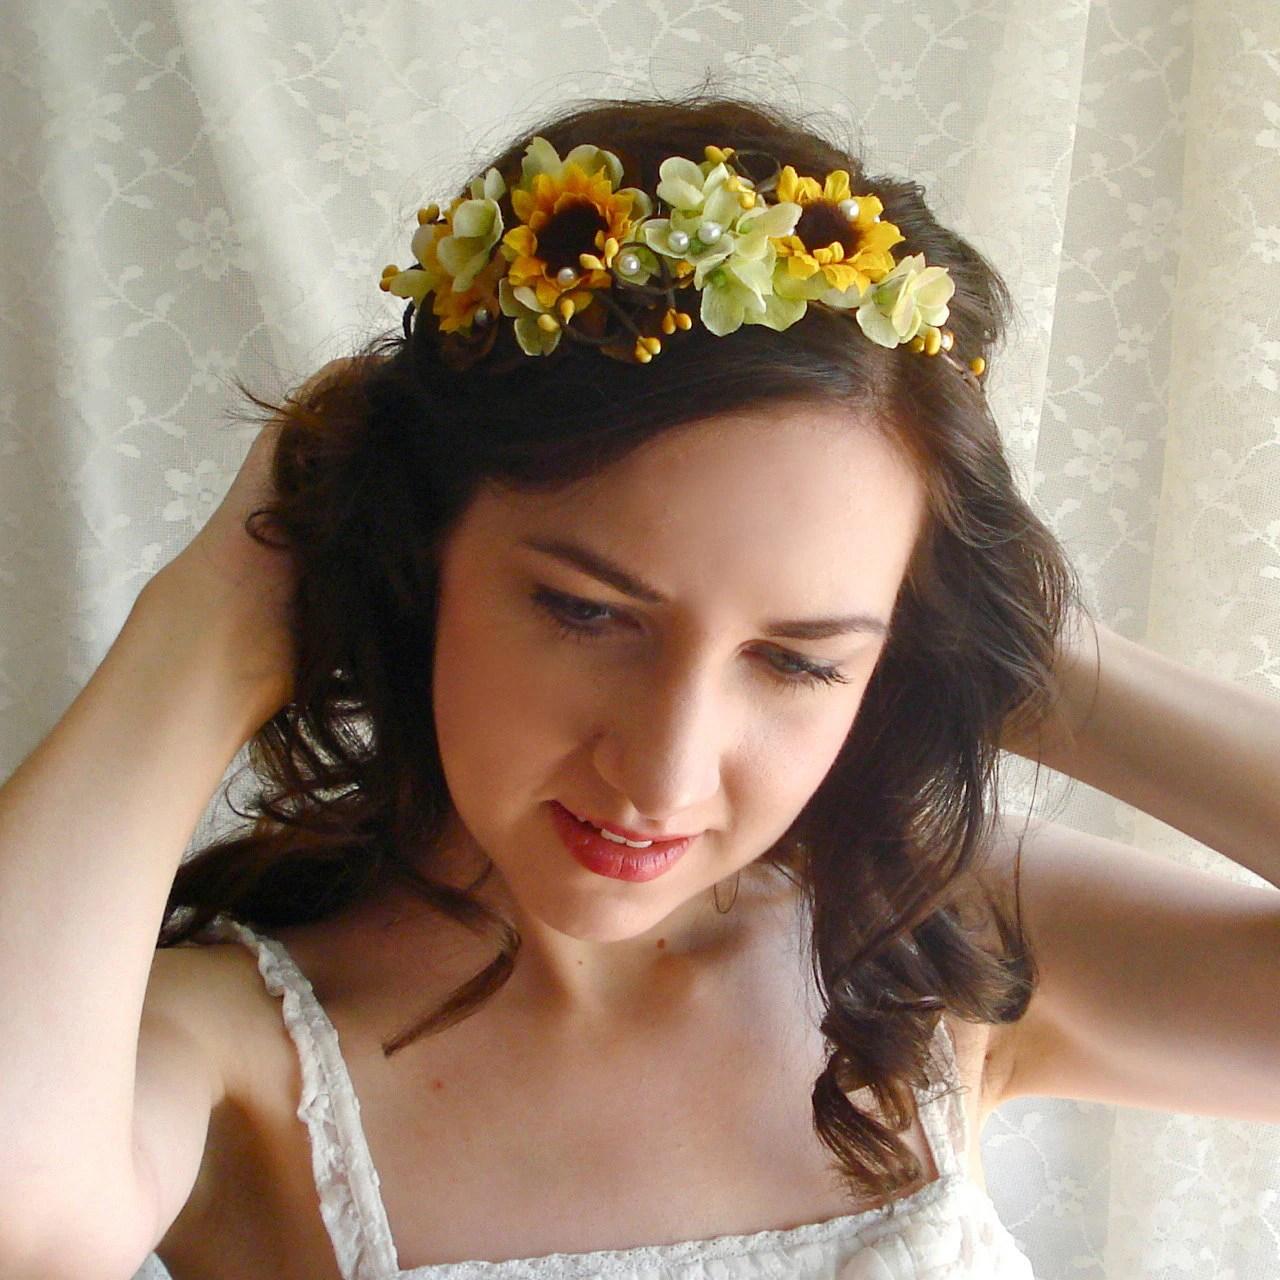 Sunflower Head Wreath Yellow Flower Accessory Bridal Hair